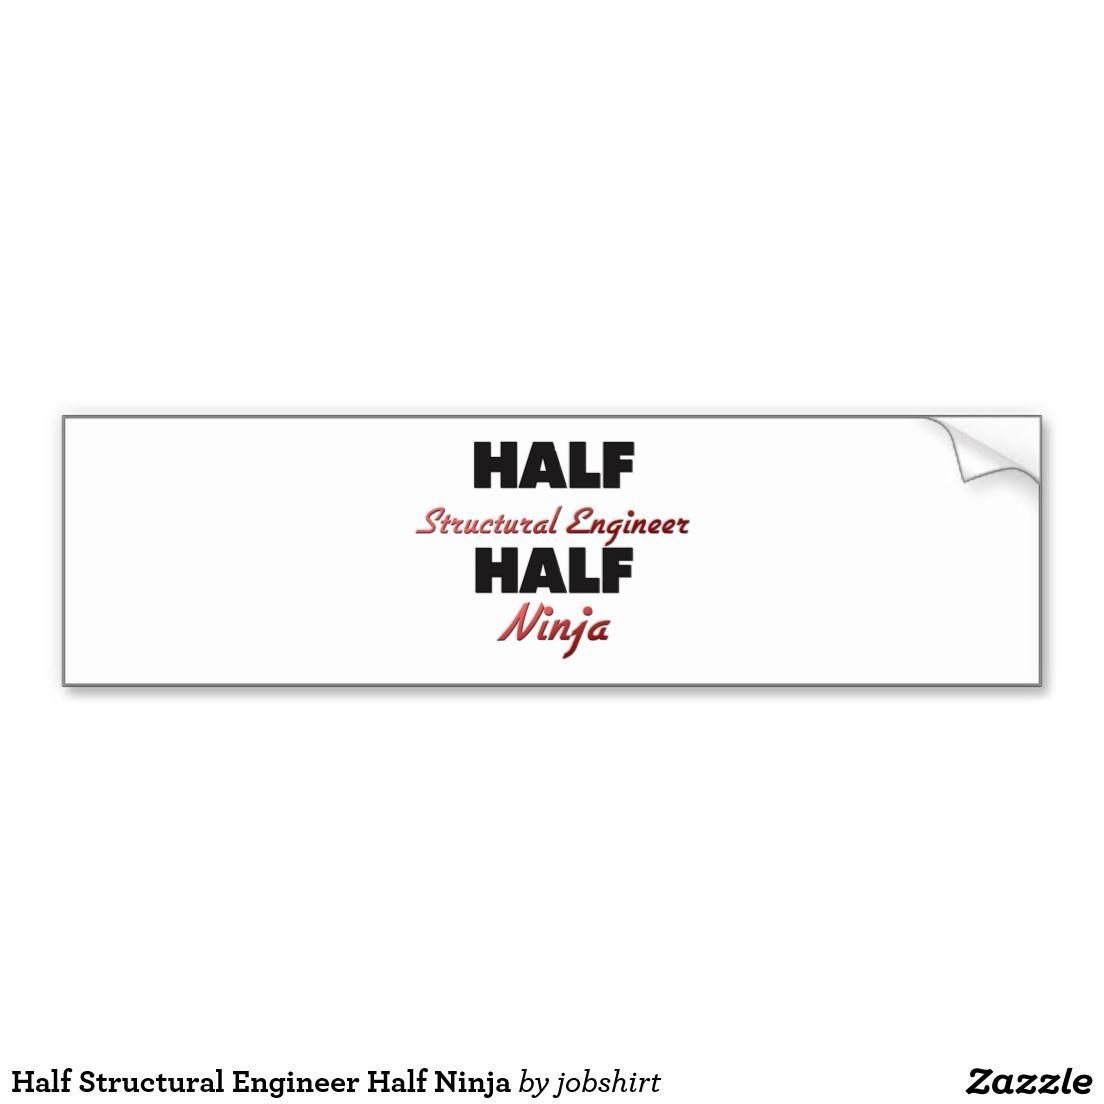 Bumper sticker design ideas - Half Structural Engineer Half Ninja Bumper Sticker